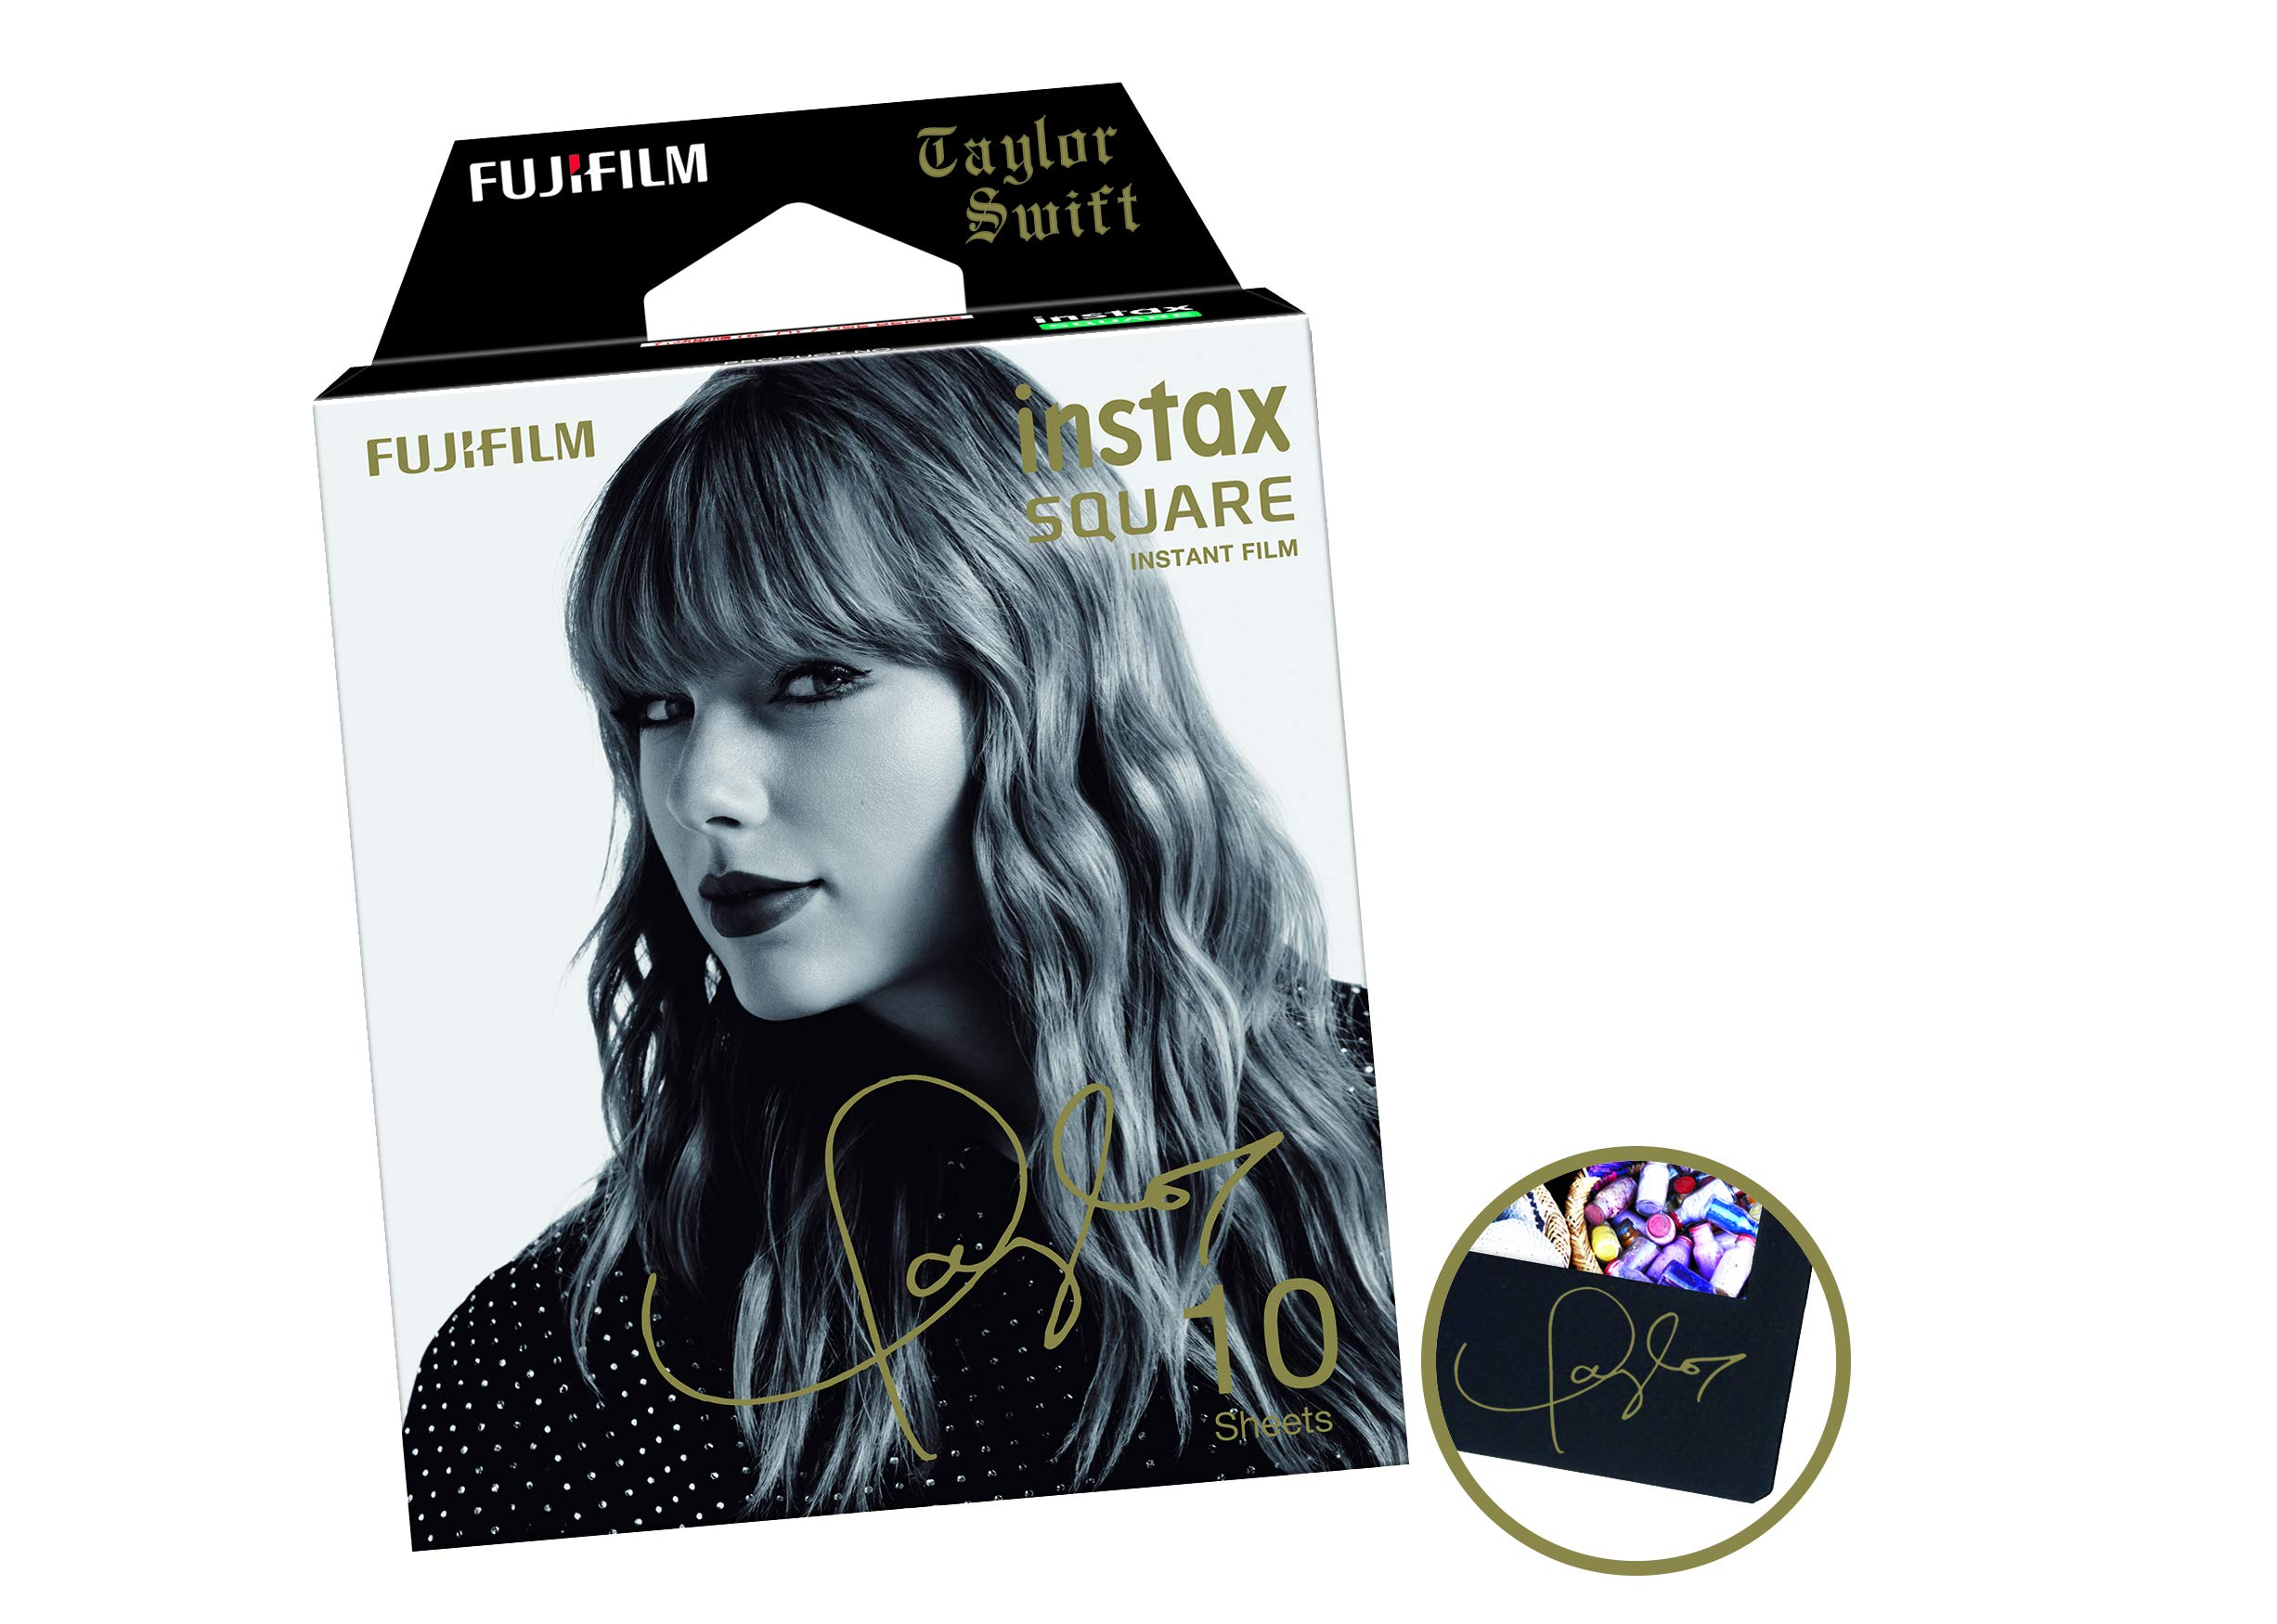 Fujifilm Instax Square Film Taylor Swift Edition (10 Exposures), Black